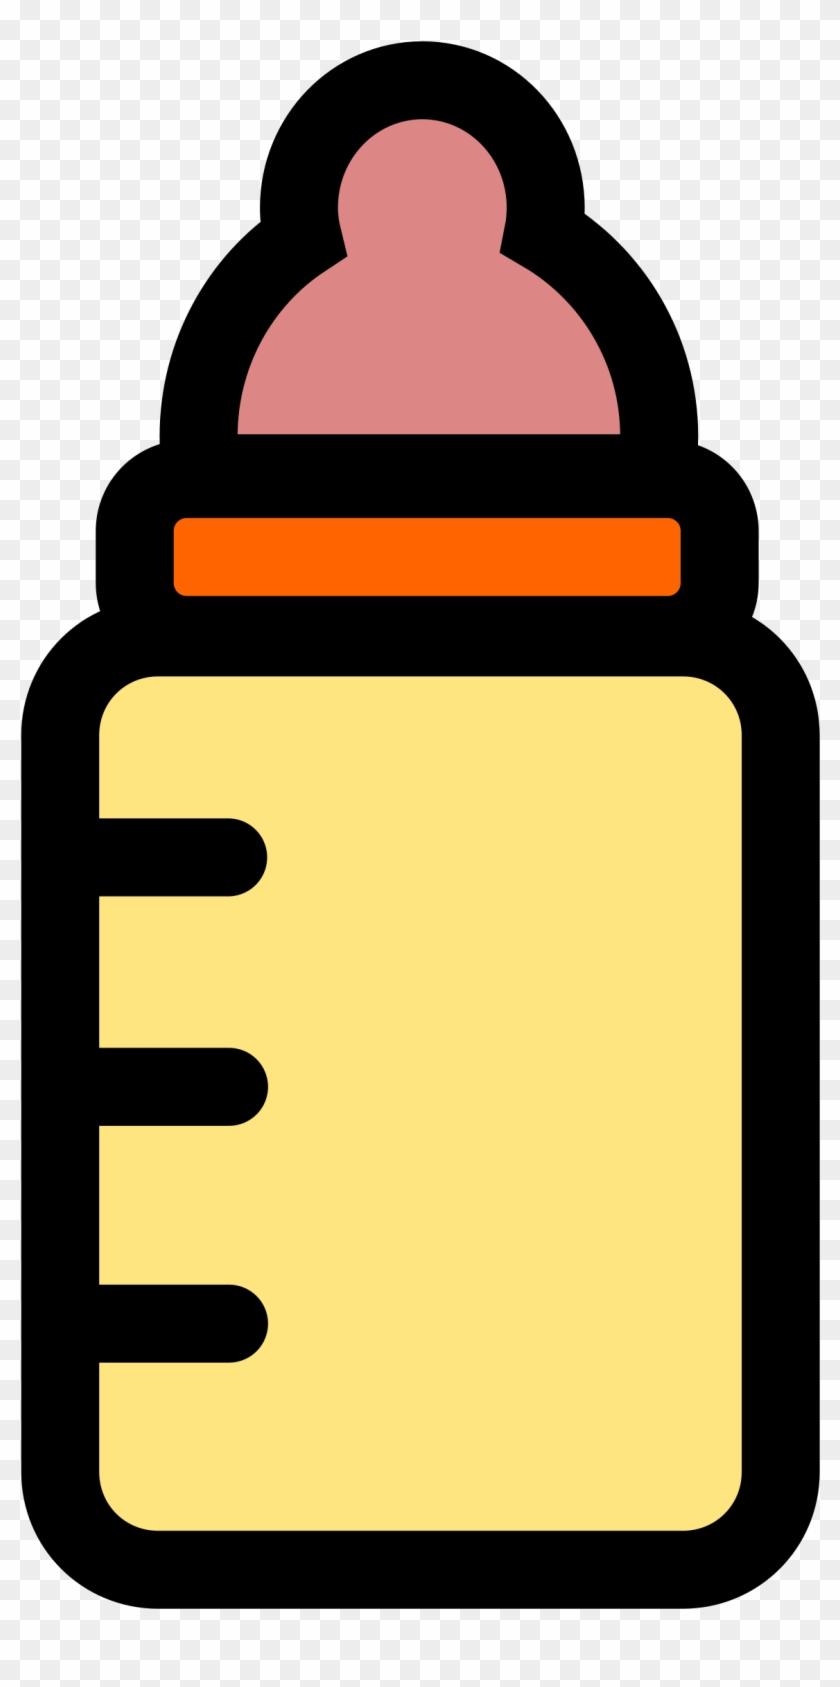 Onlinelabels Clip Art - Draw A Baby Bottle Easy #96553